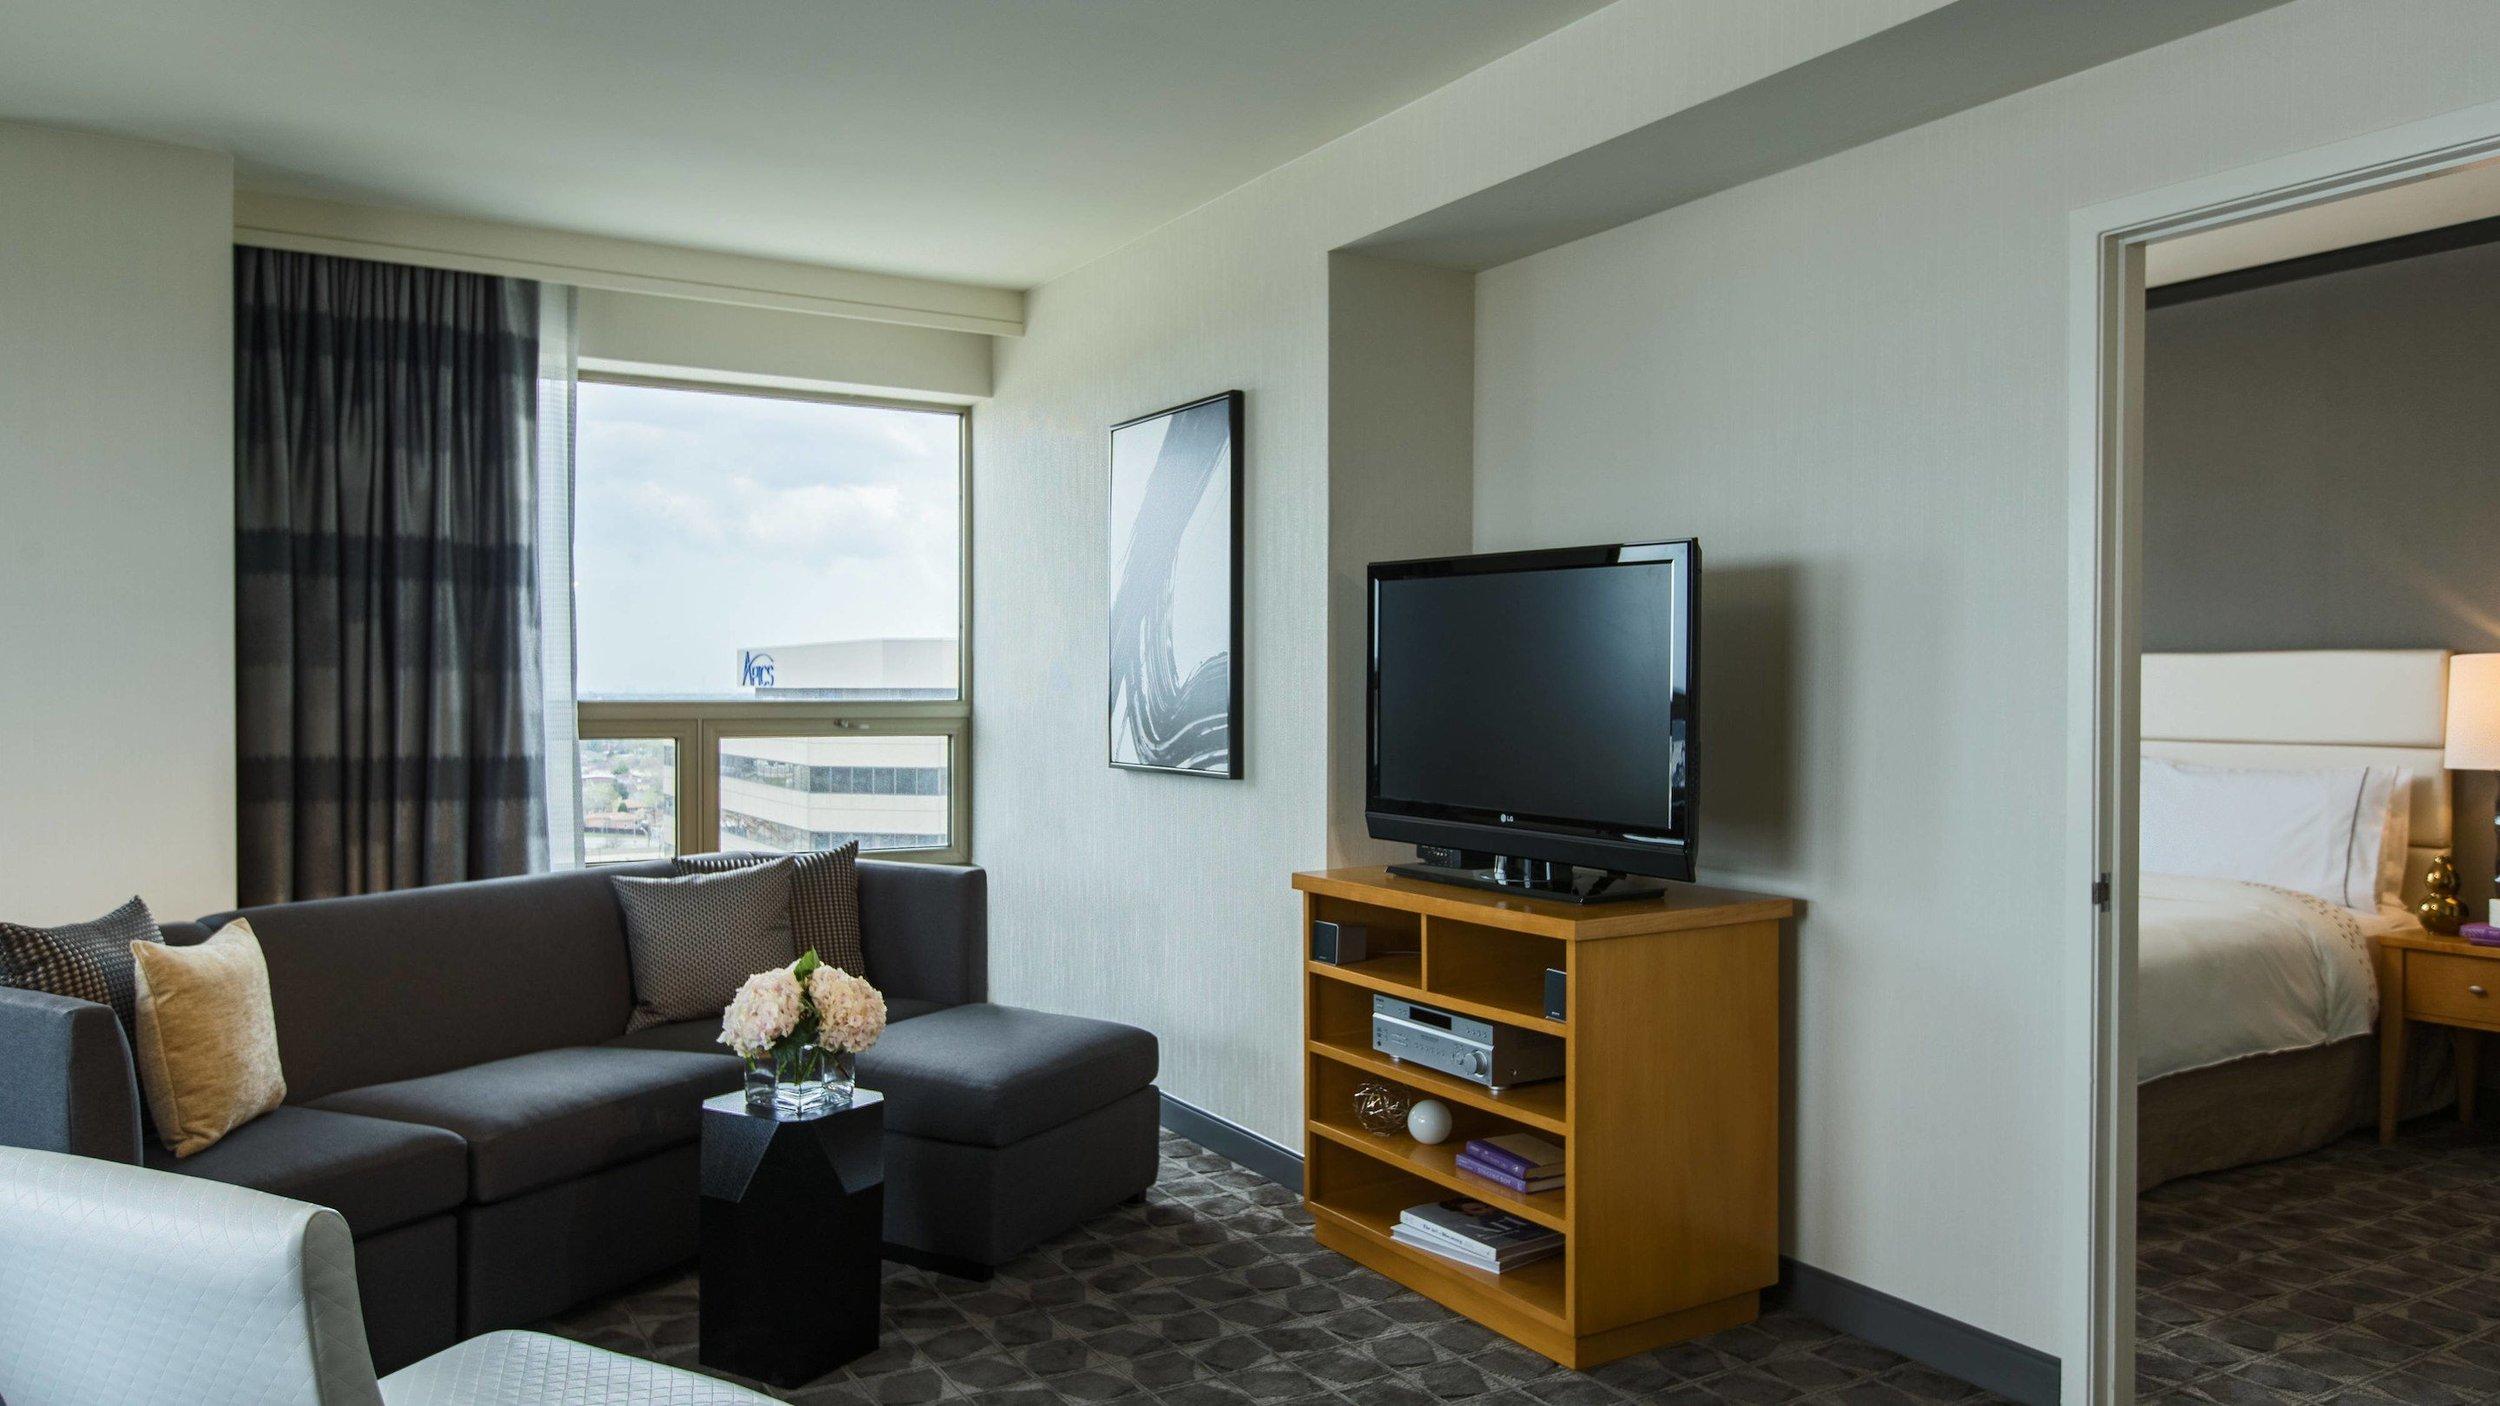 MARRIOTT RENAISSANCE - O'HARE - 8500 West Bryn Mawr AvenueChicago, IL 60631Tel: 773.380.9600Map LinkTripAdvisor Reviews